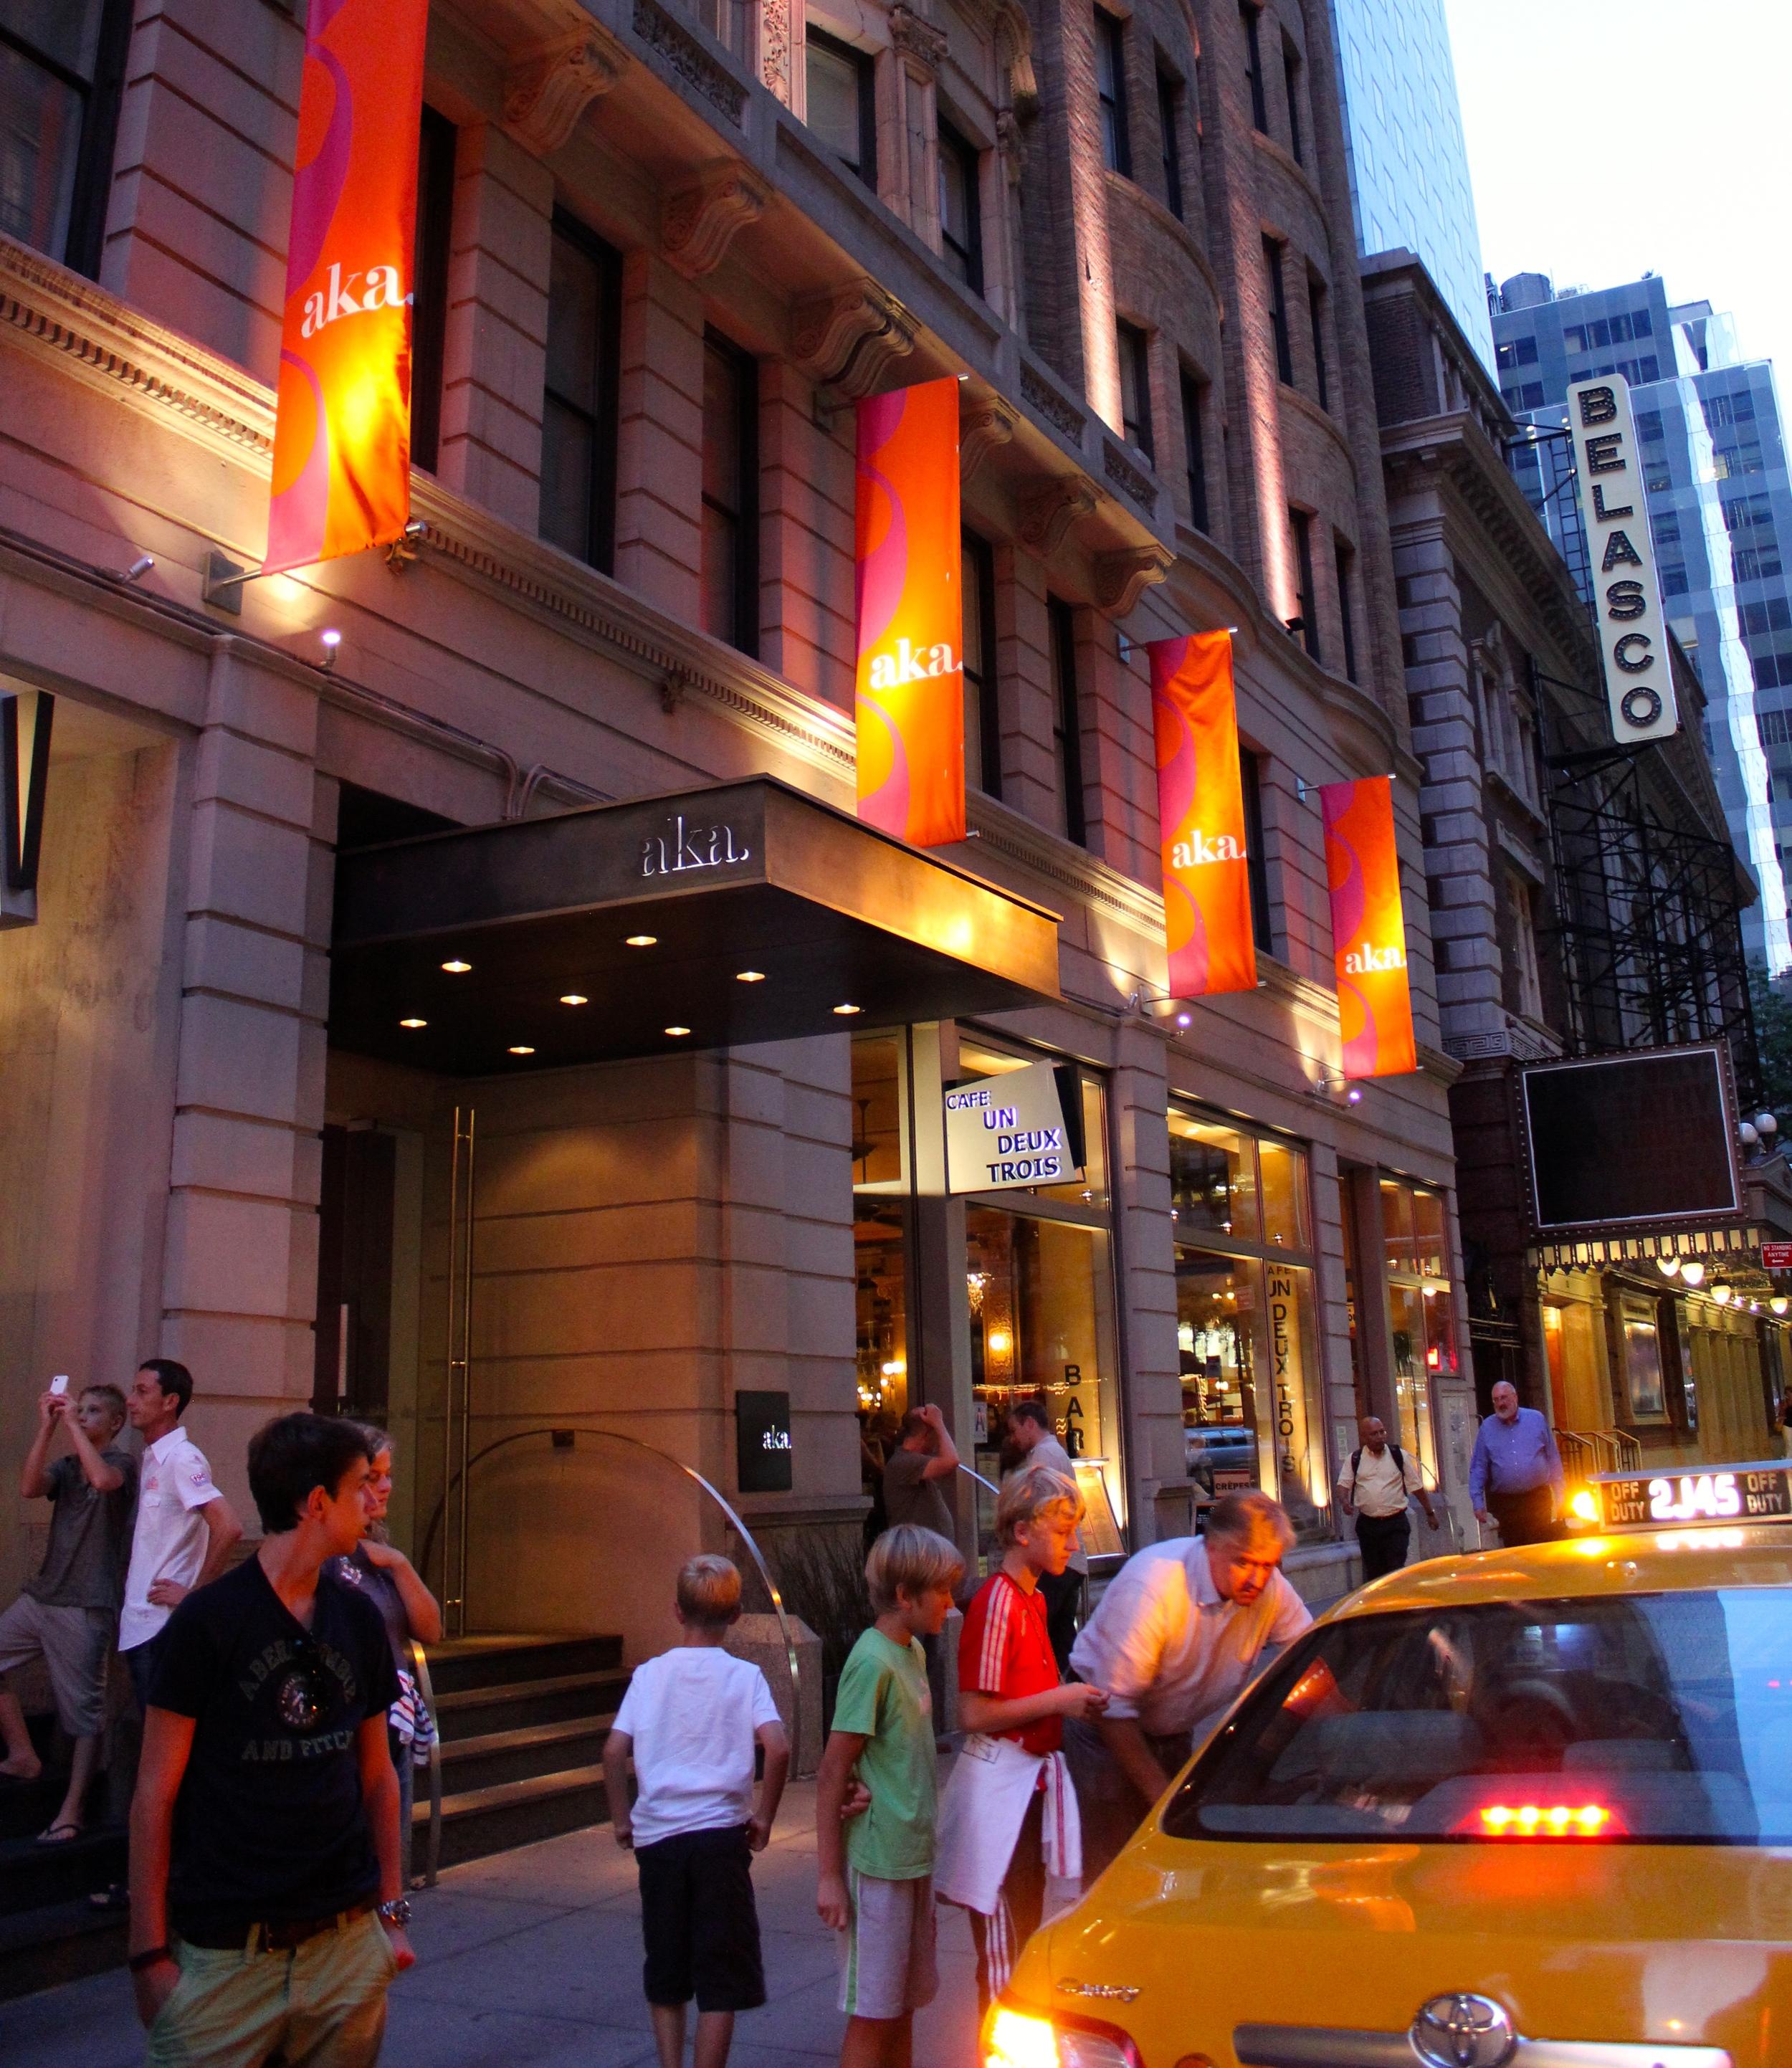 aka. Hotel am Times Square